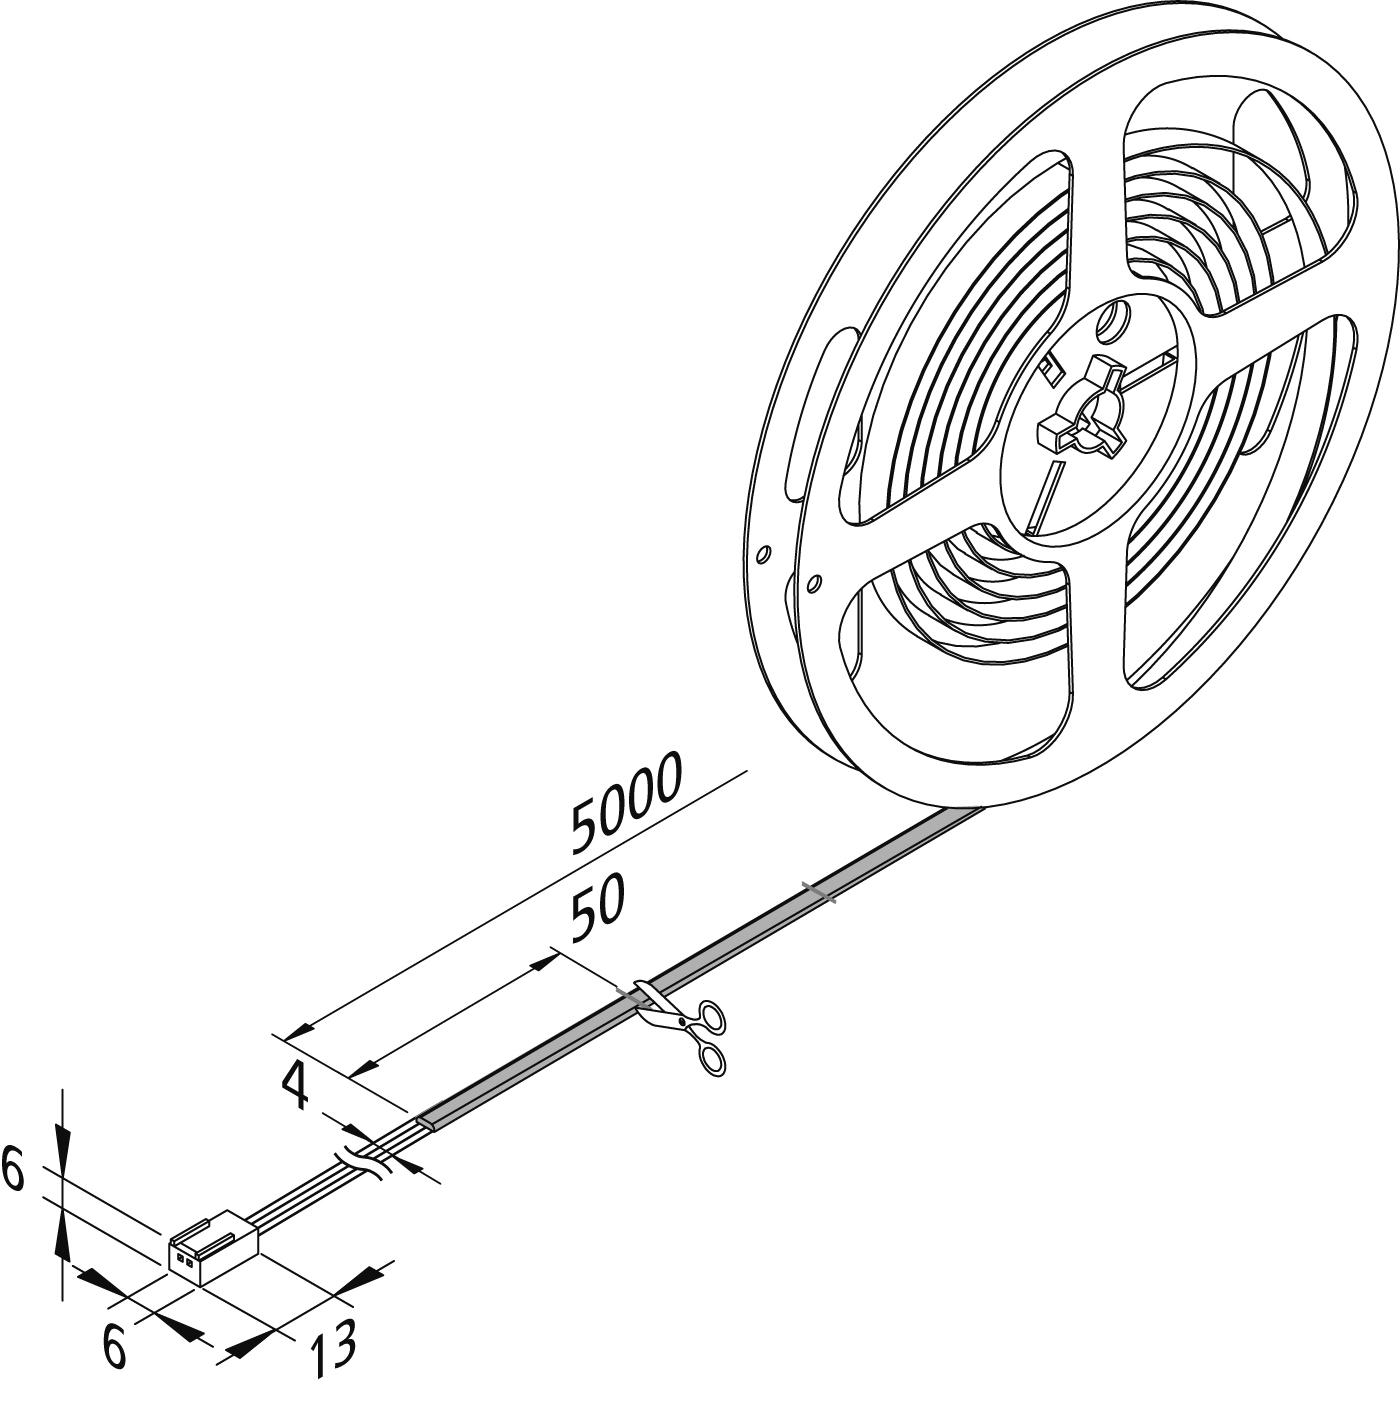 Anteprima: LED-Tape-COB-4-_ZA